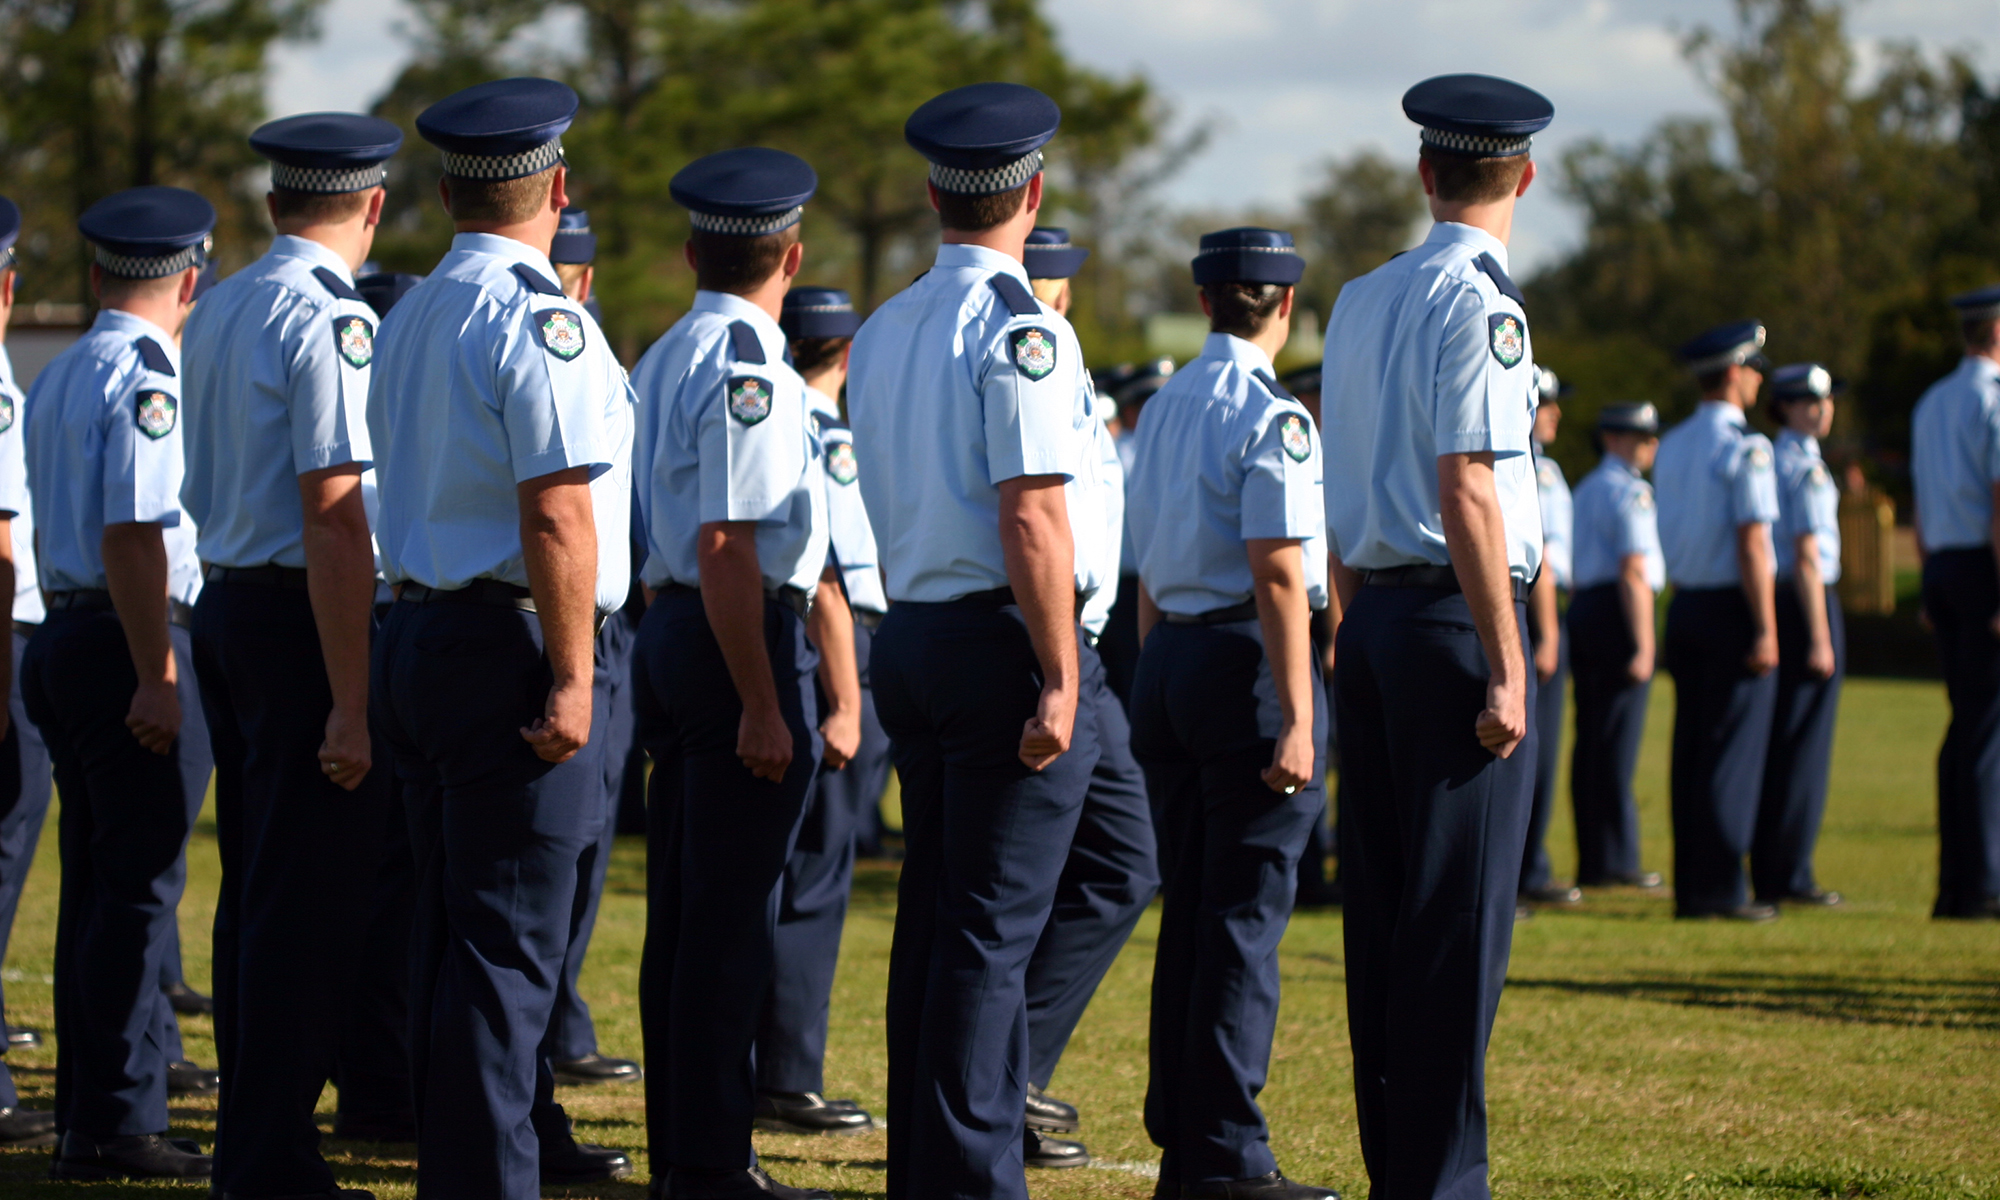 How Police Academies Work | HowStuffWorks